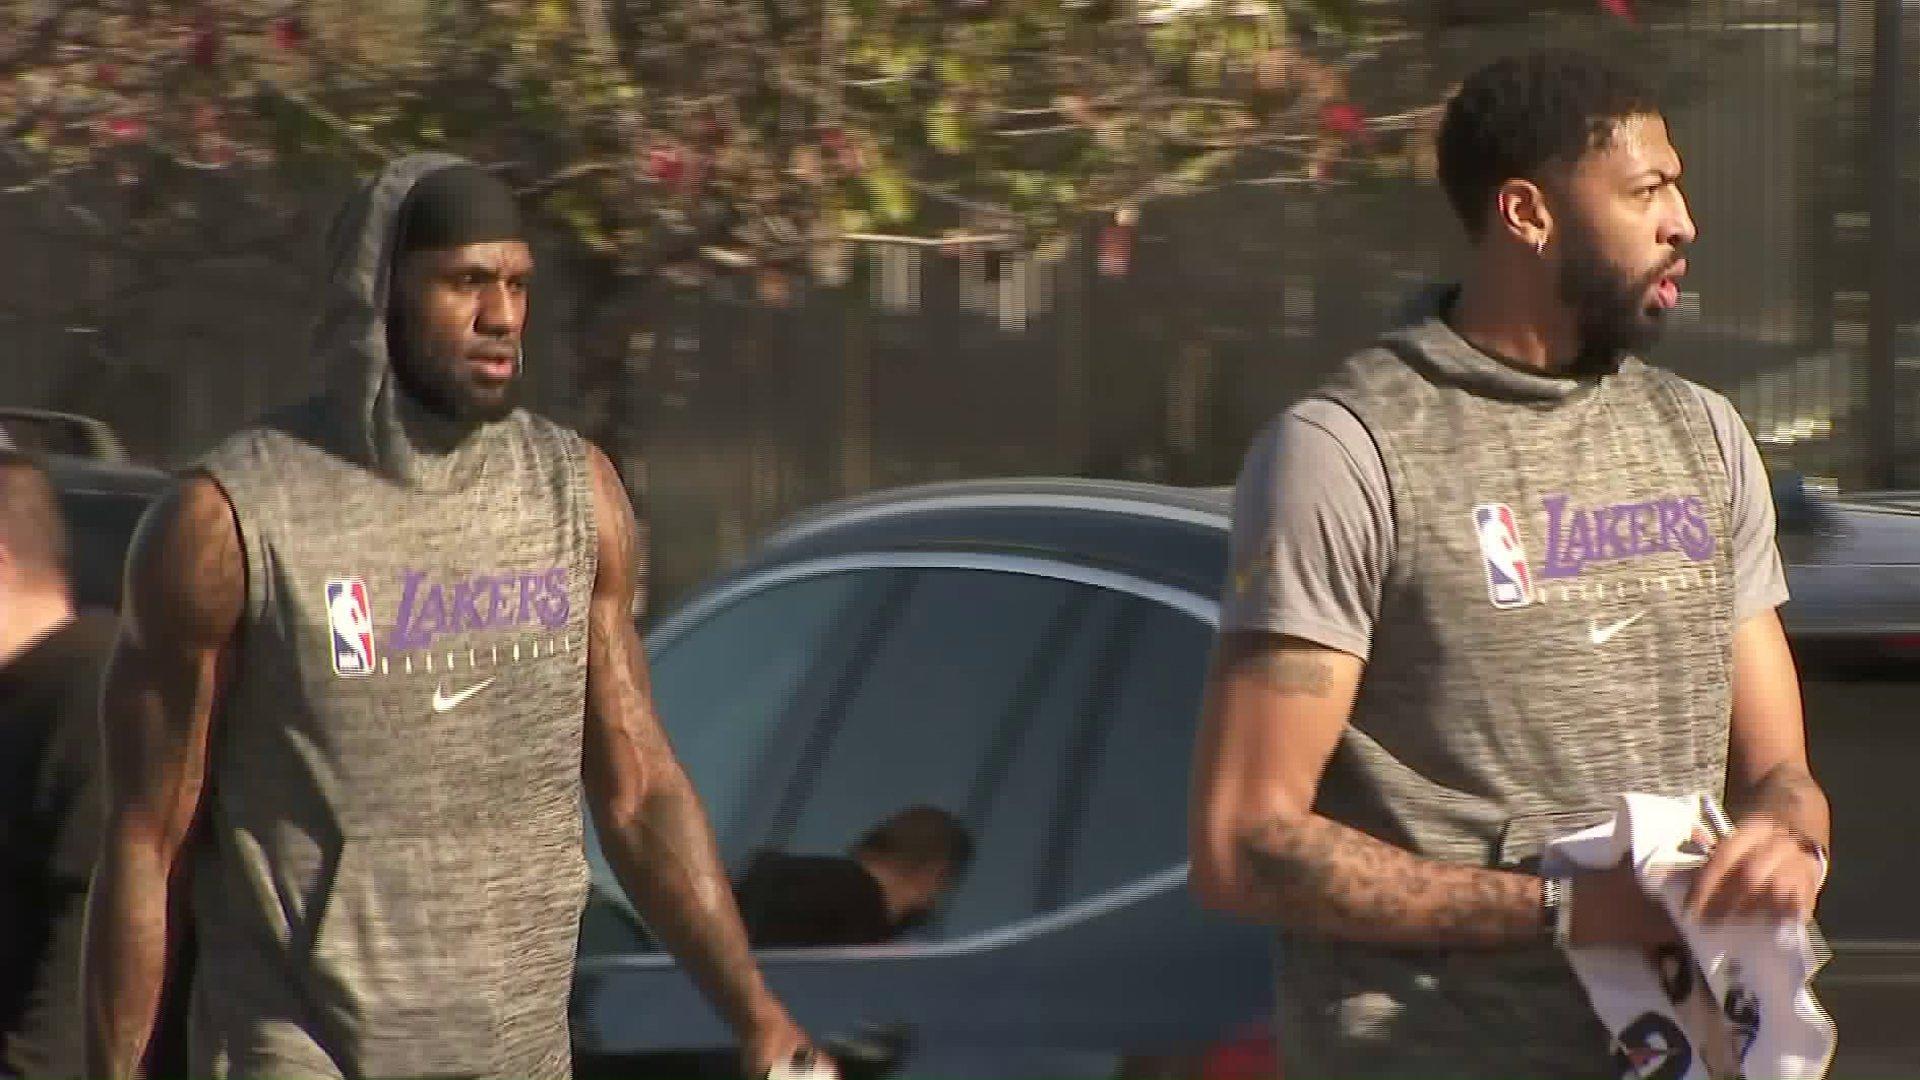 LeBron James, left, and Anthony Davis walk to the Los Angeles Lakers' practice facility in El Segundo on Jan. 29, 2020. (Credit: KTLA)